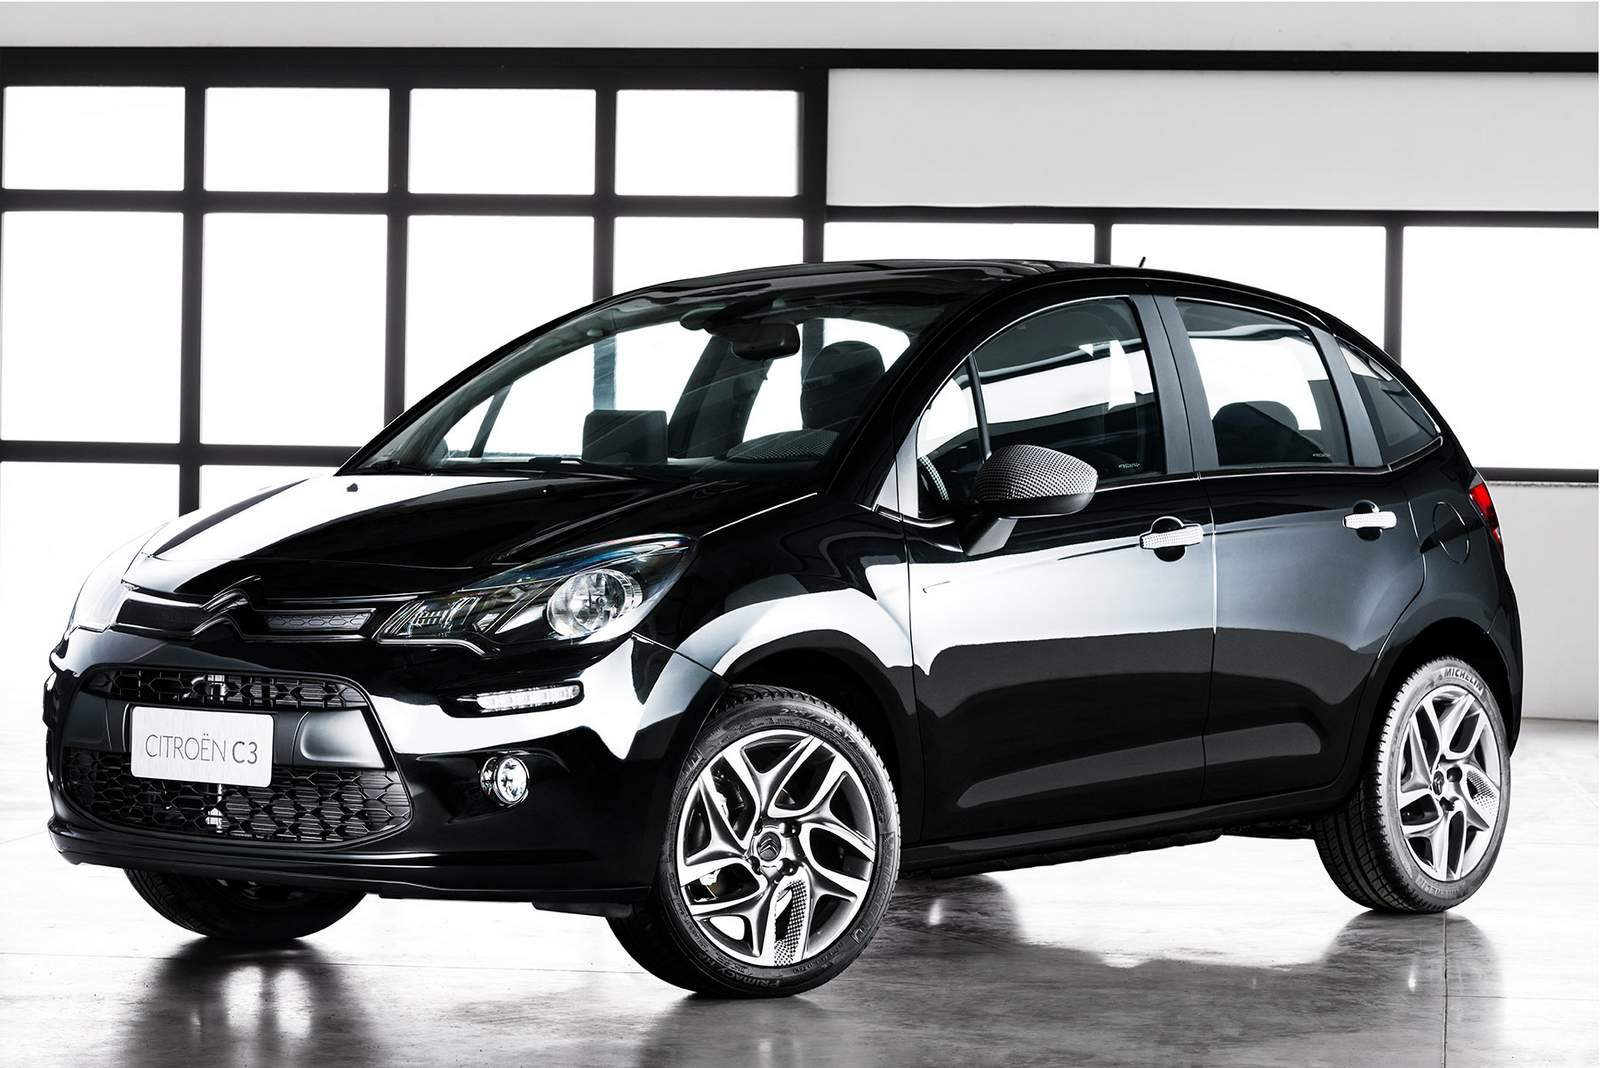 [SALON] Salon Automobile de Sao Paulo 2014 Citroen%2BC3%2BParis%2BVintage%2B%282%29